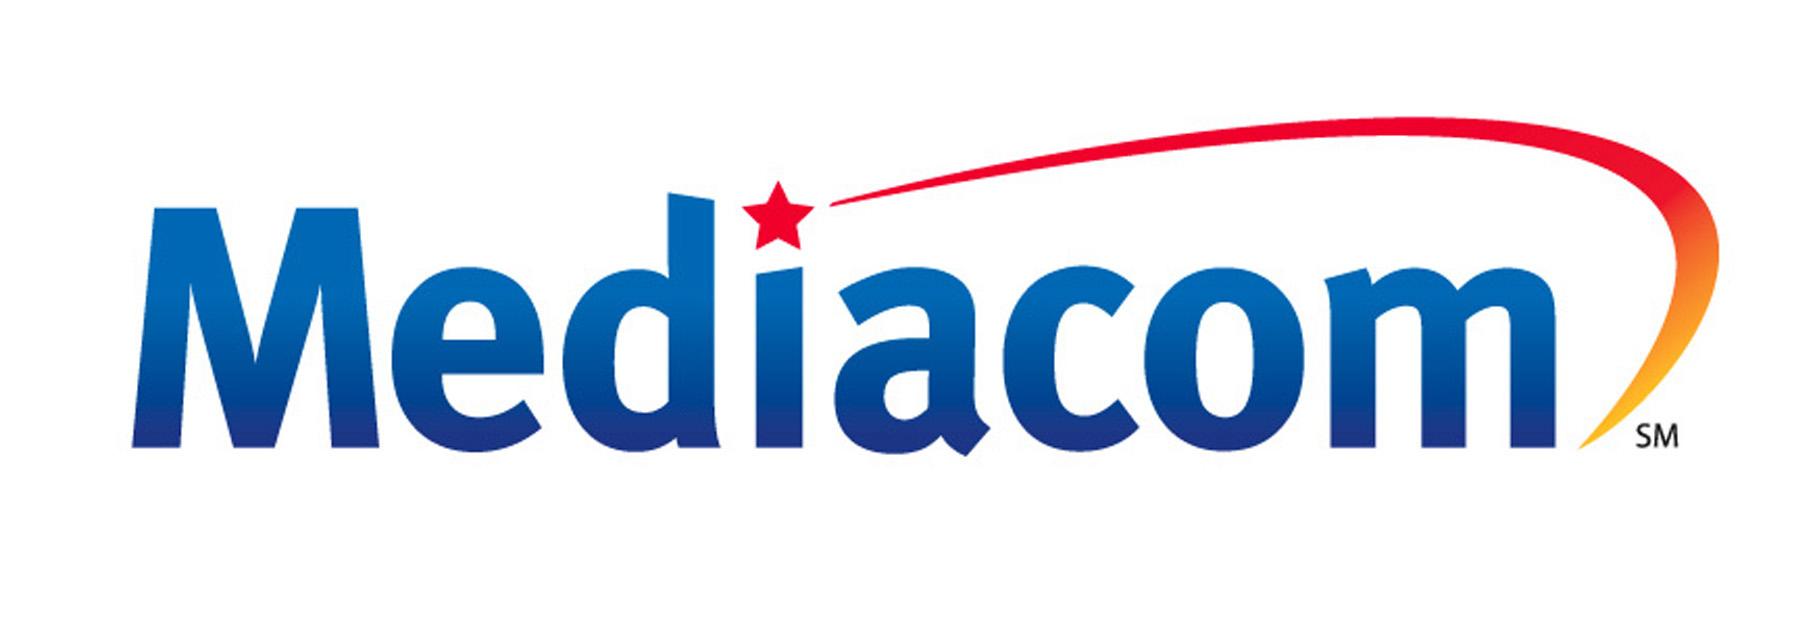 Mediacom+logo.jpeg